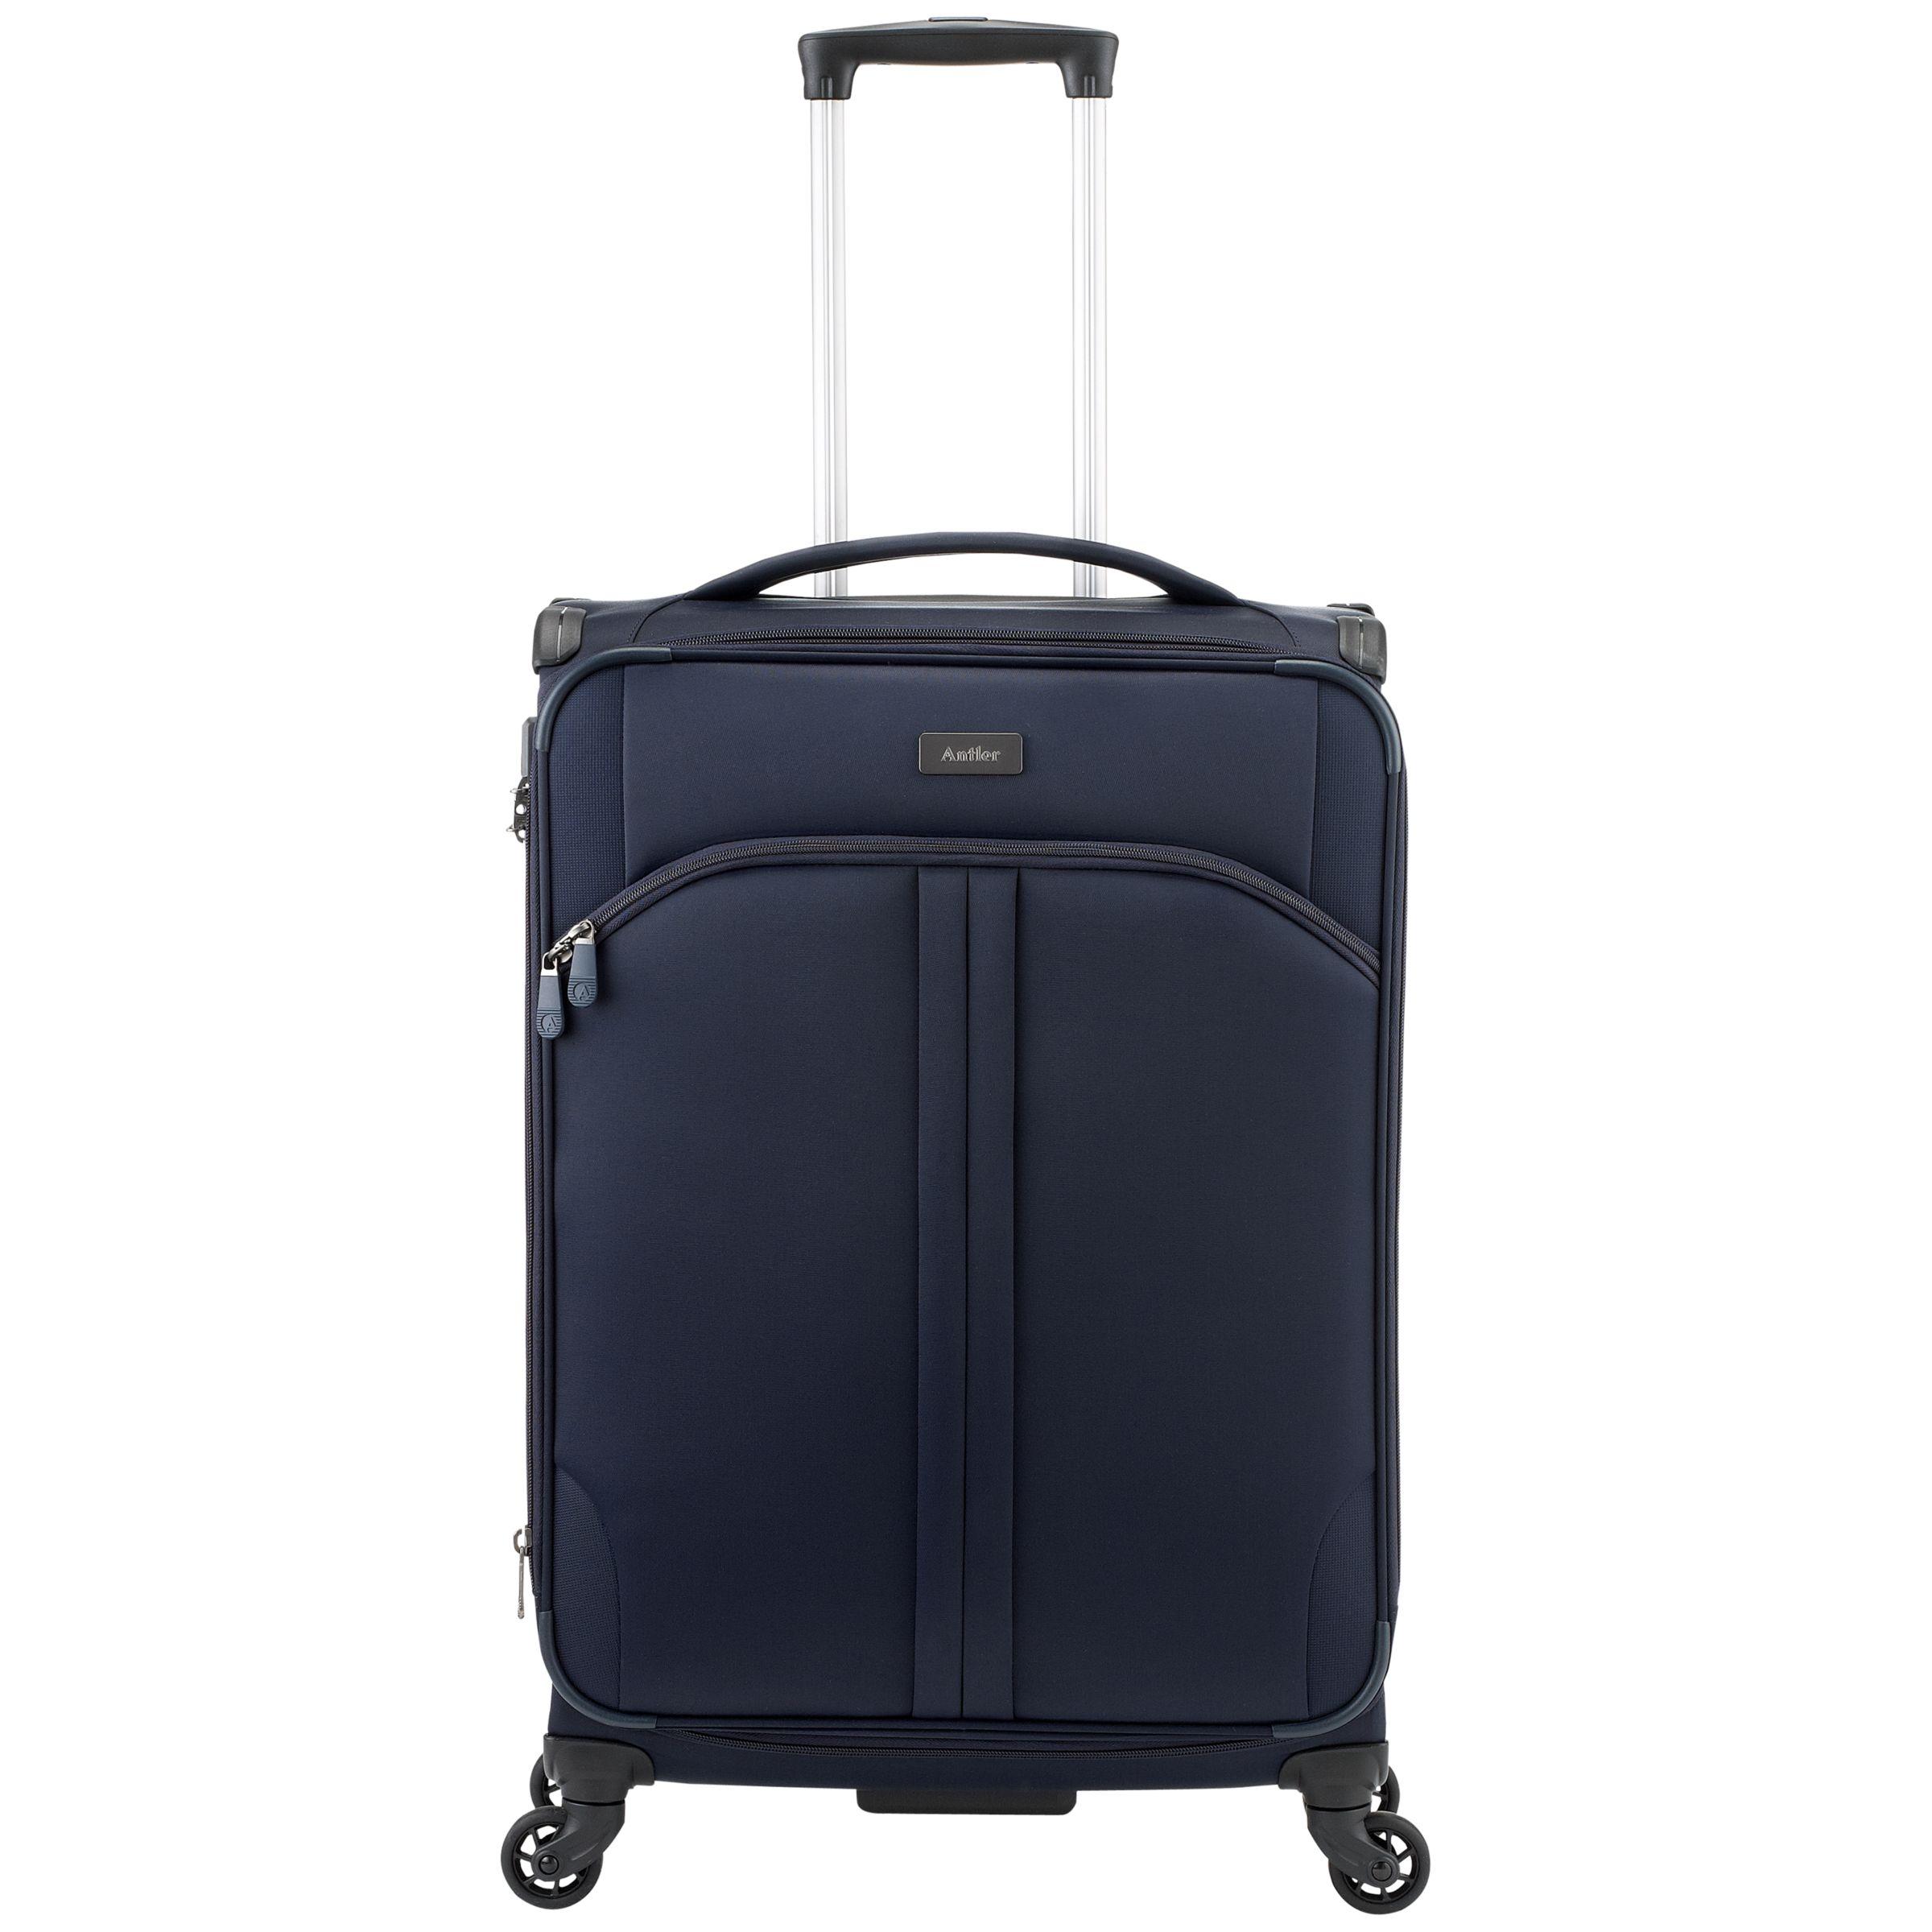 Antler Antler Aire 4-Wheel 68cm Medium Suitcase